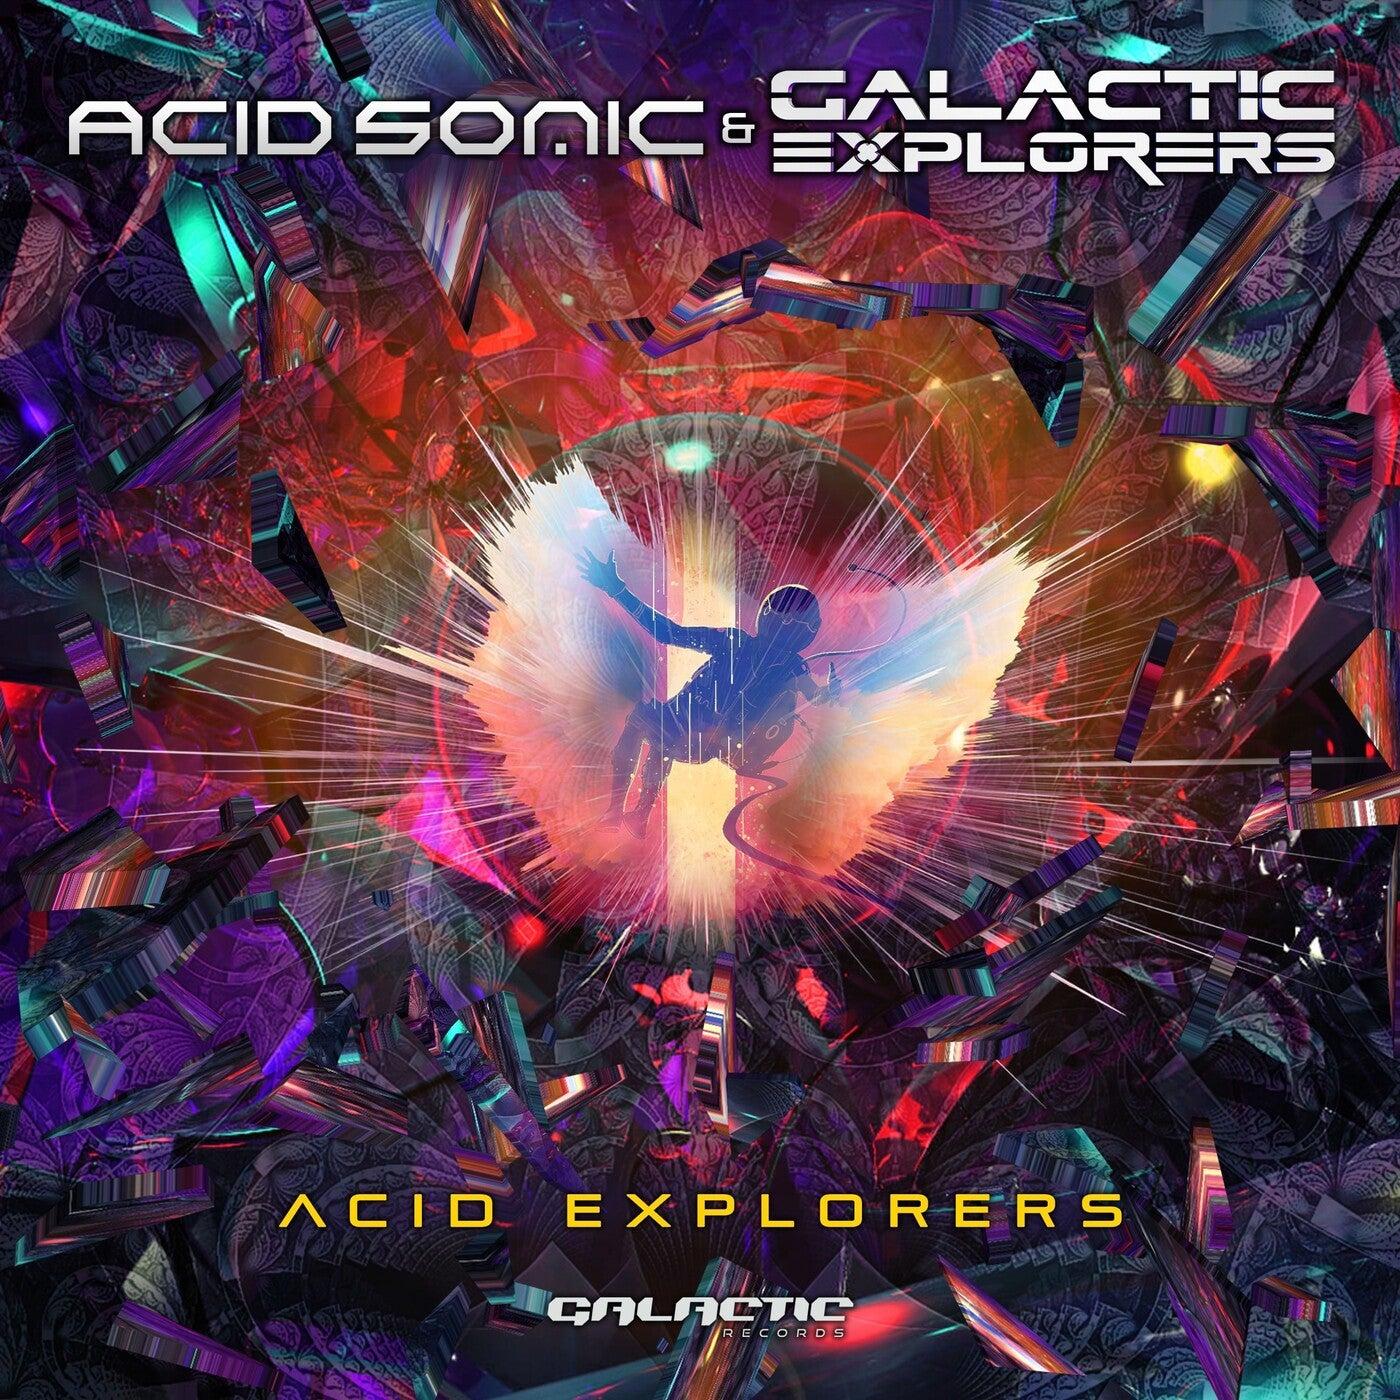 Acid Explorers (Original Mix)